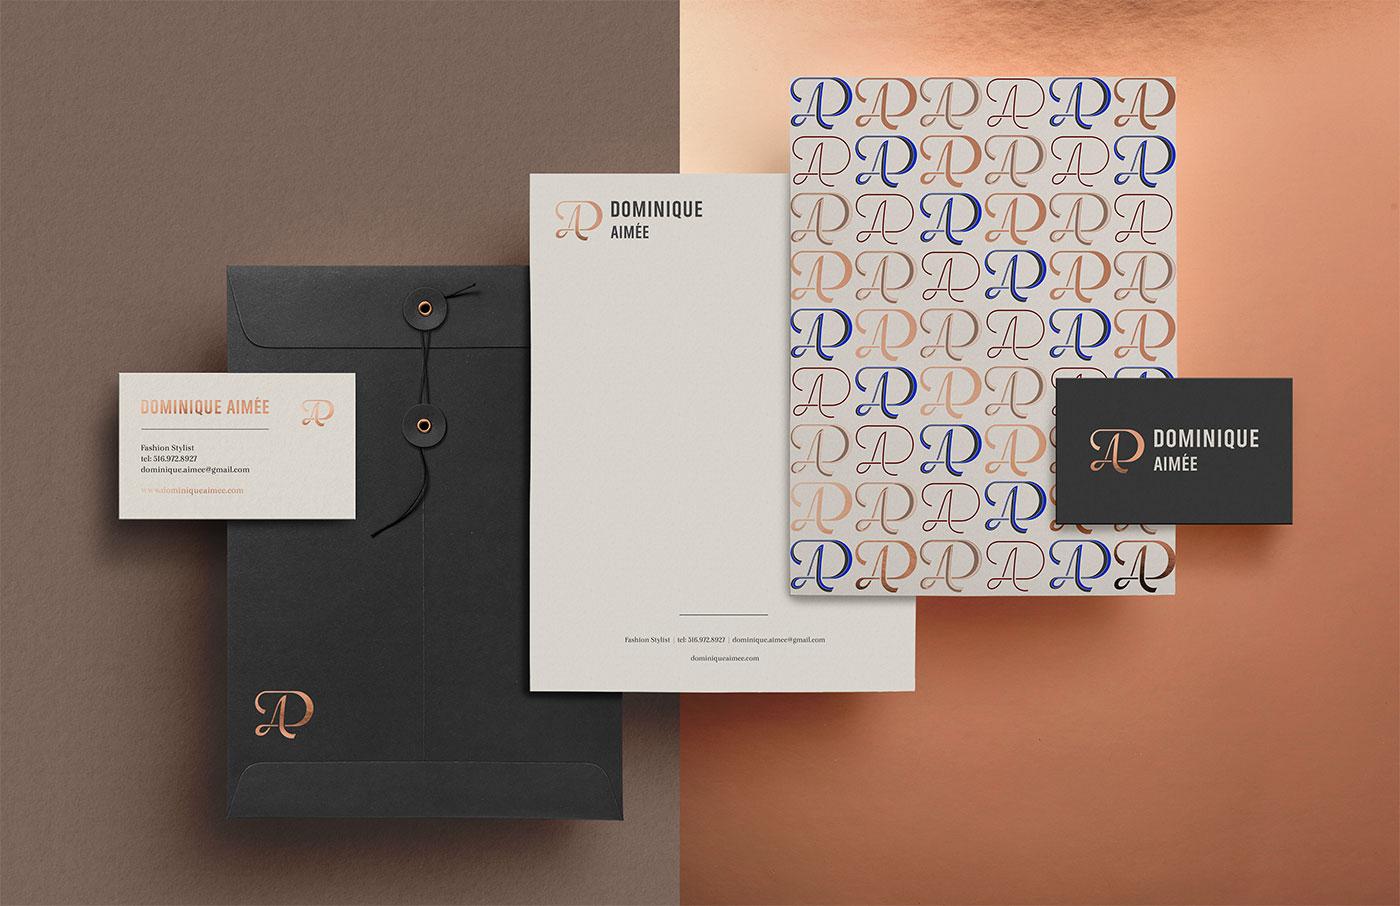 Outfit Branding Dominique Aimée Stationery Letterhead Cards